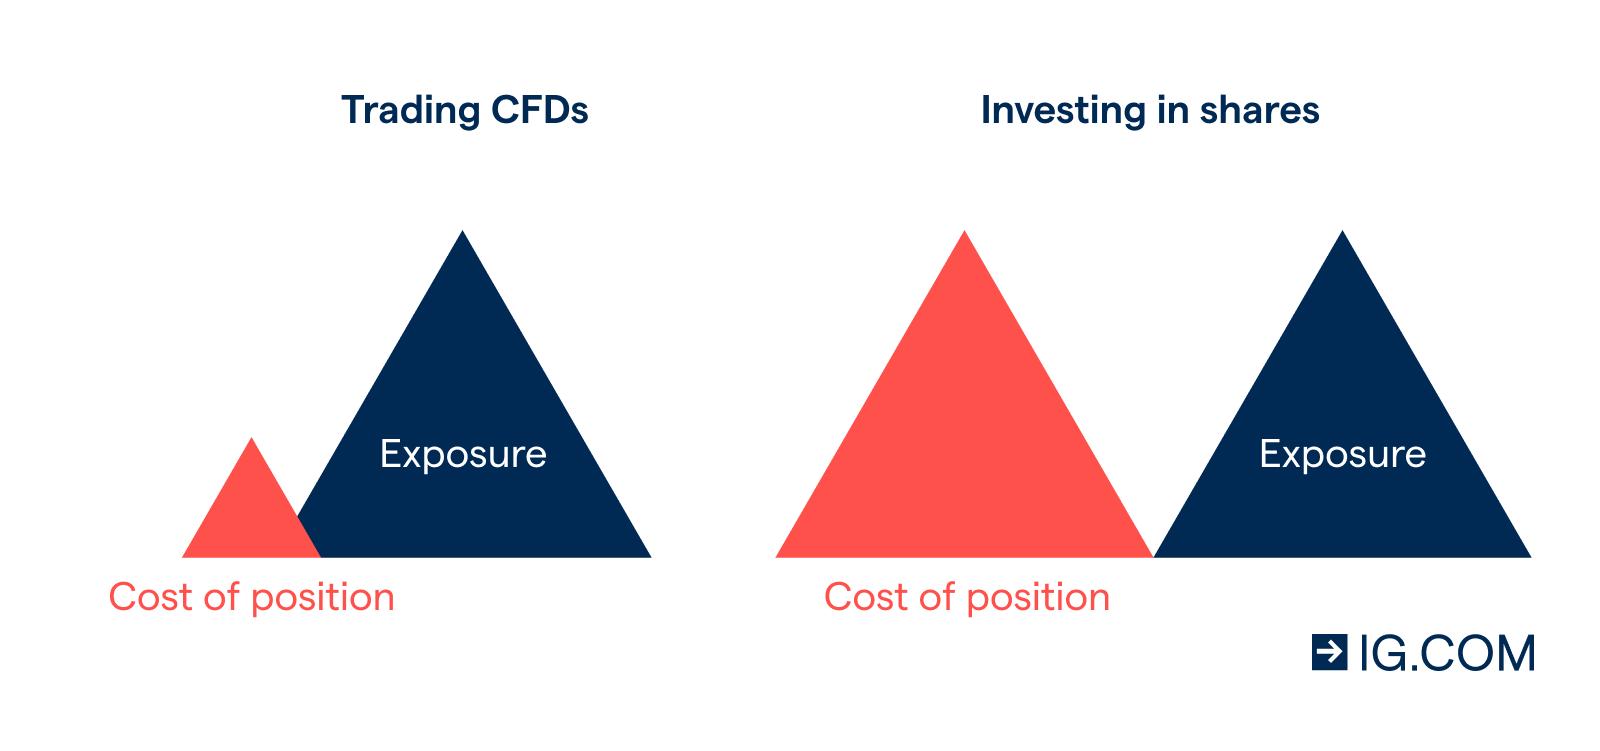 kostenlose mobile forex handelssoftware cfd vs share trading